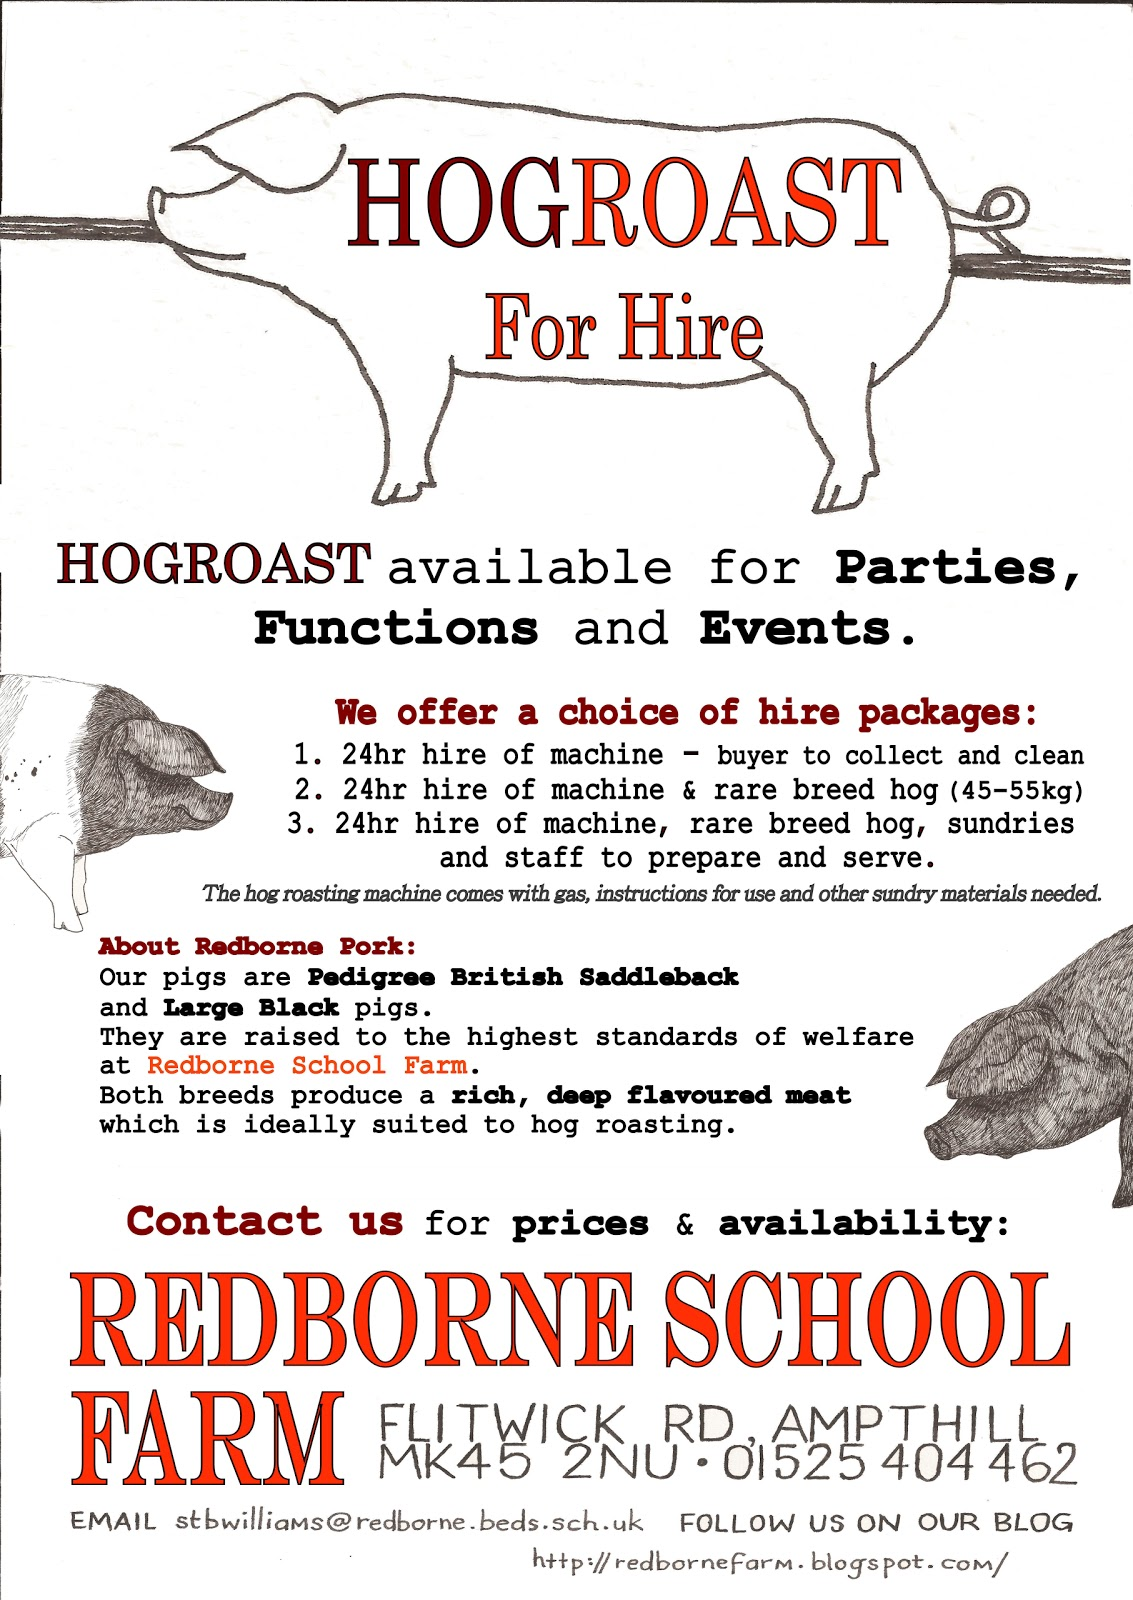 redborne school farm october 2011. Black Bedroom Furniture Sets. Home Design Ideas